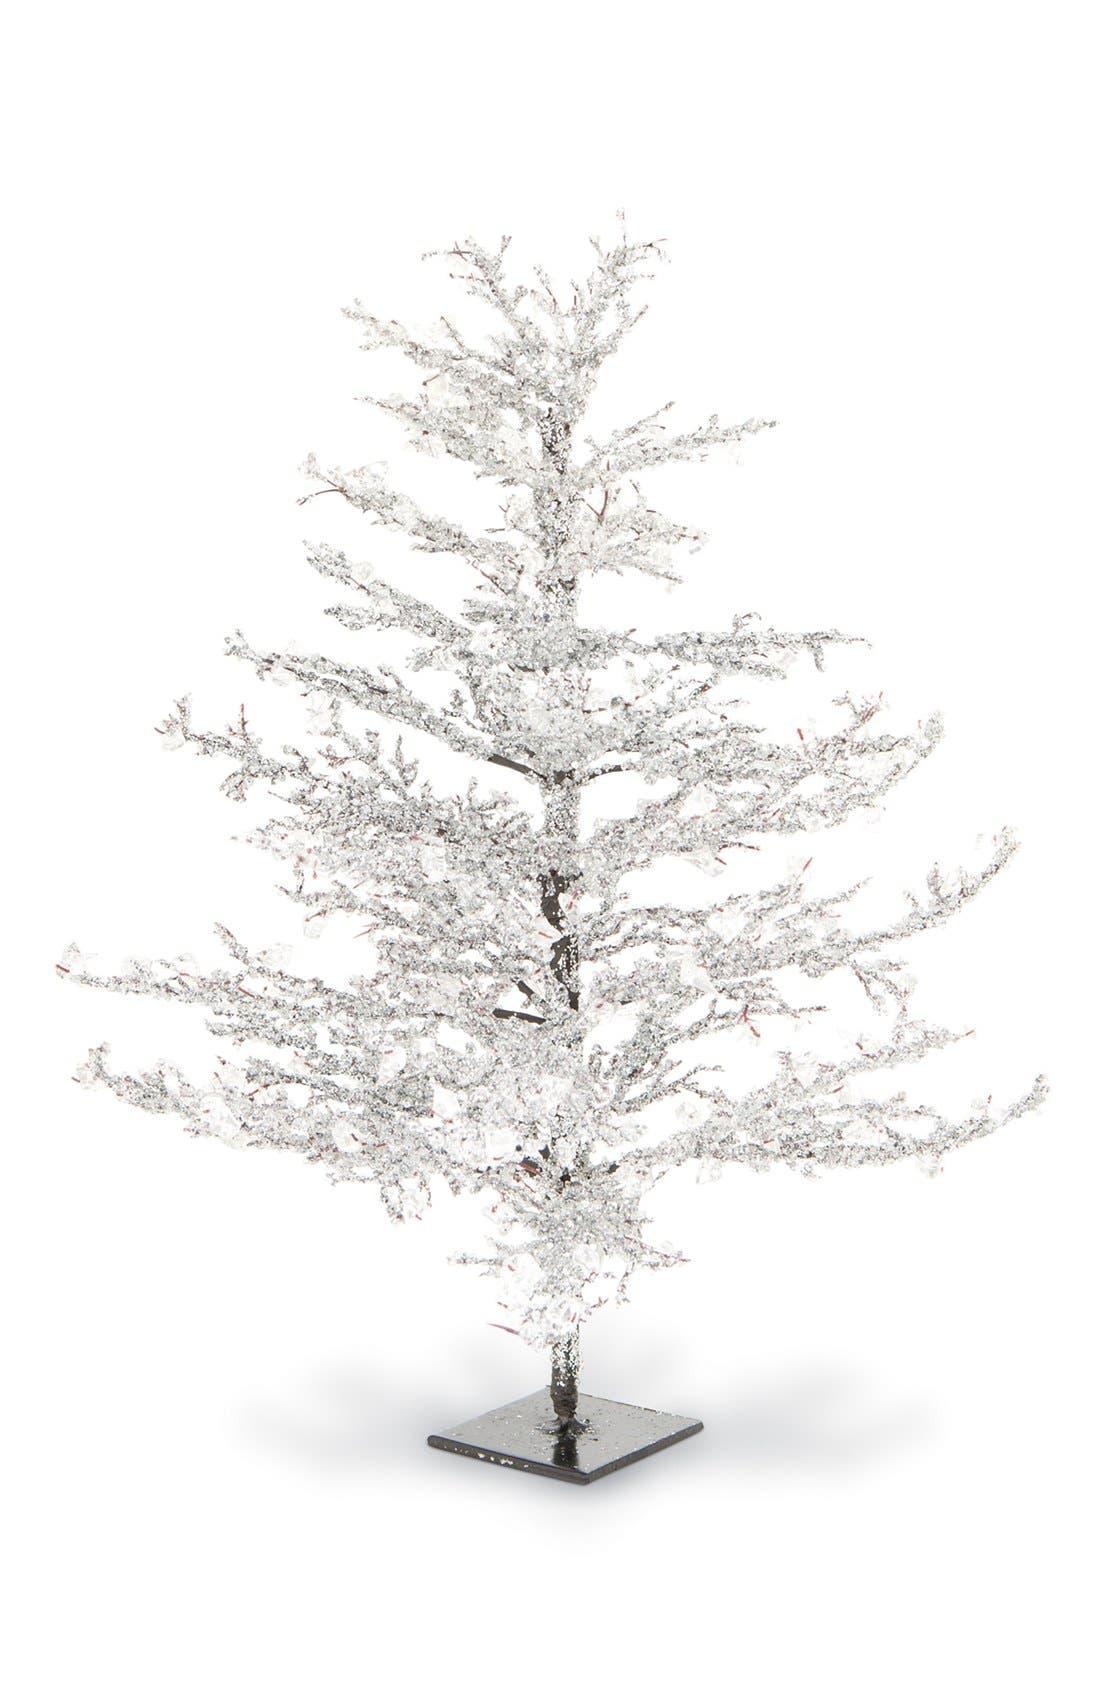 Alternate Image 1 Selected - K & K Interiors Iced Christmas Tree